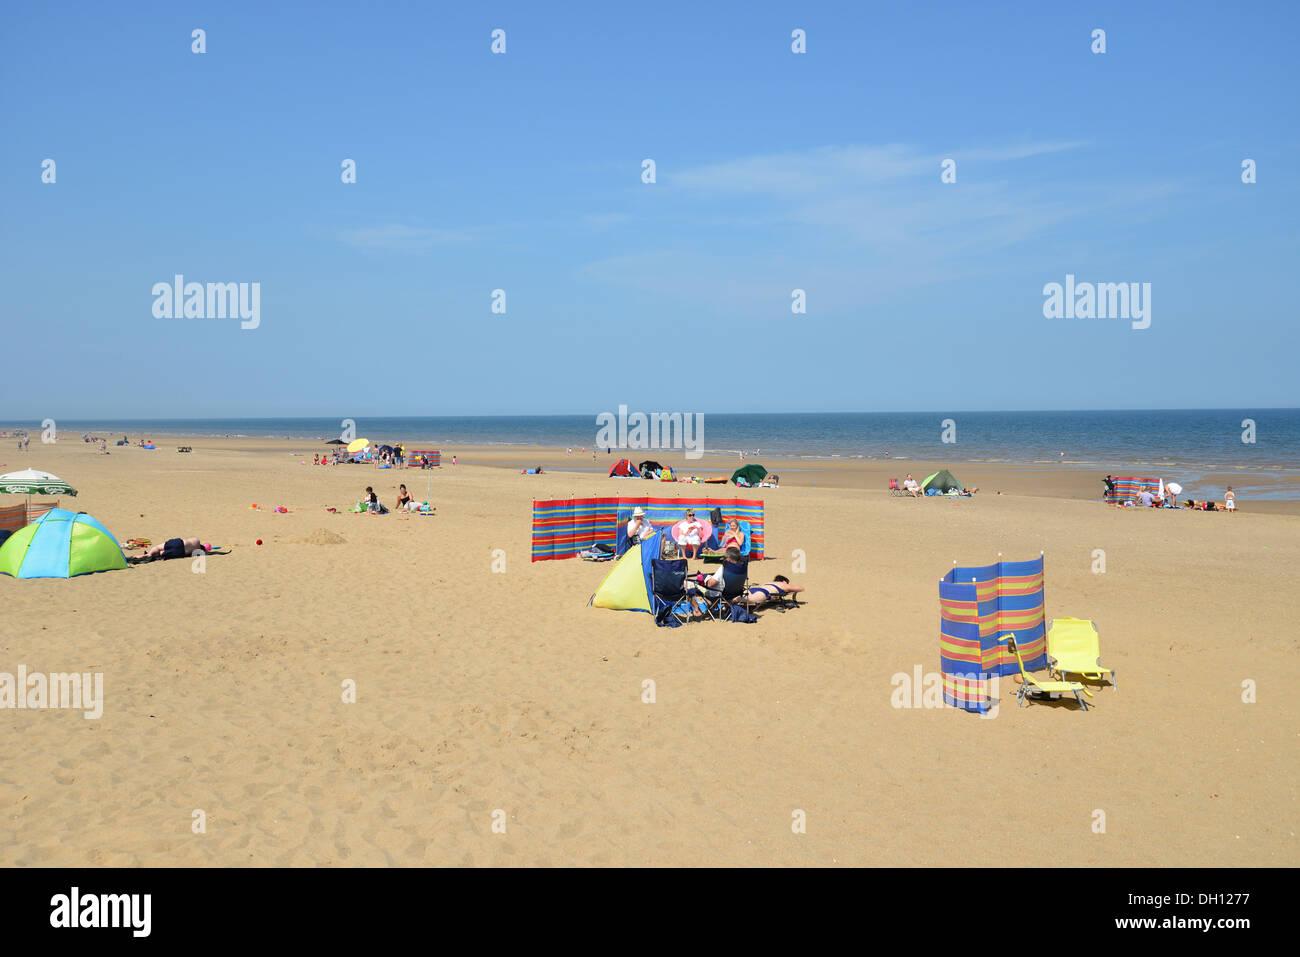 Beach view, Sutton-on-Sea, Lincolnshire, England, United Kingdom - Stock Image